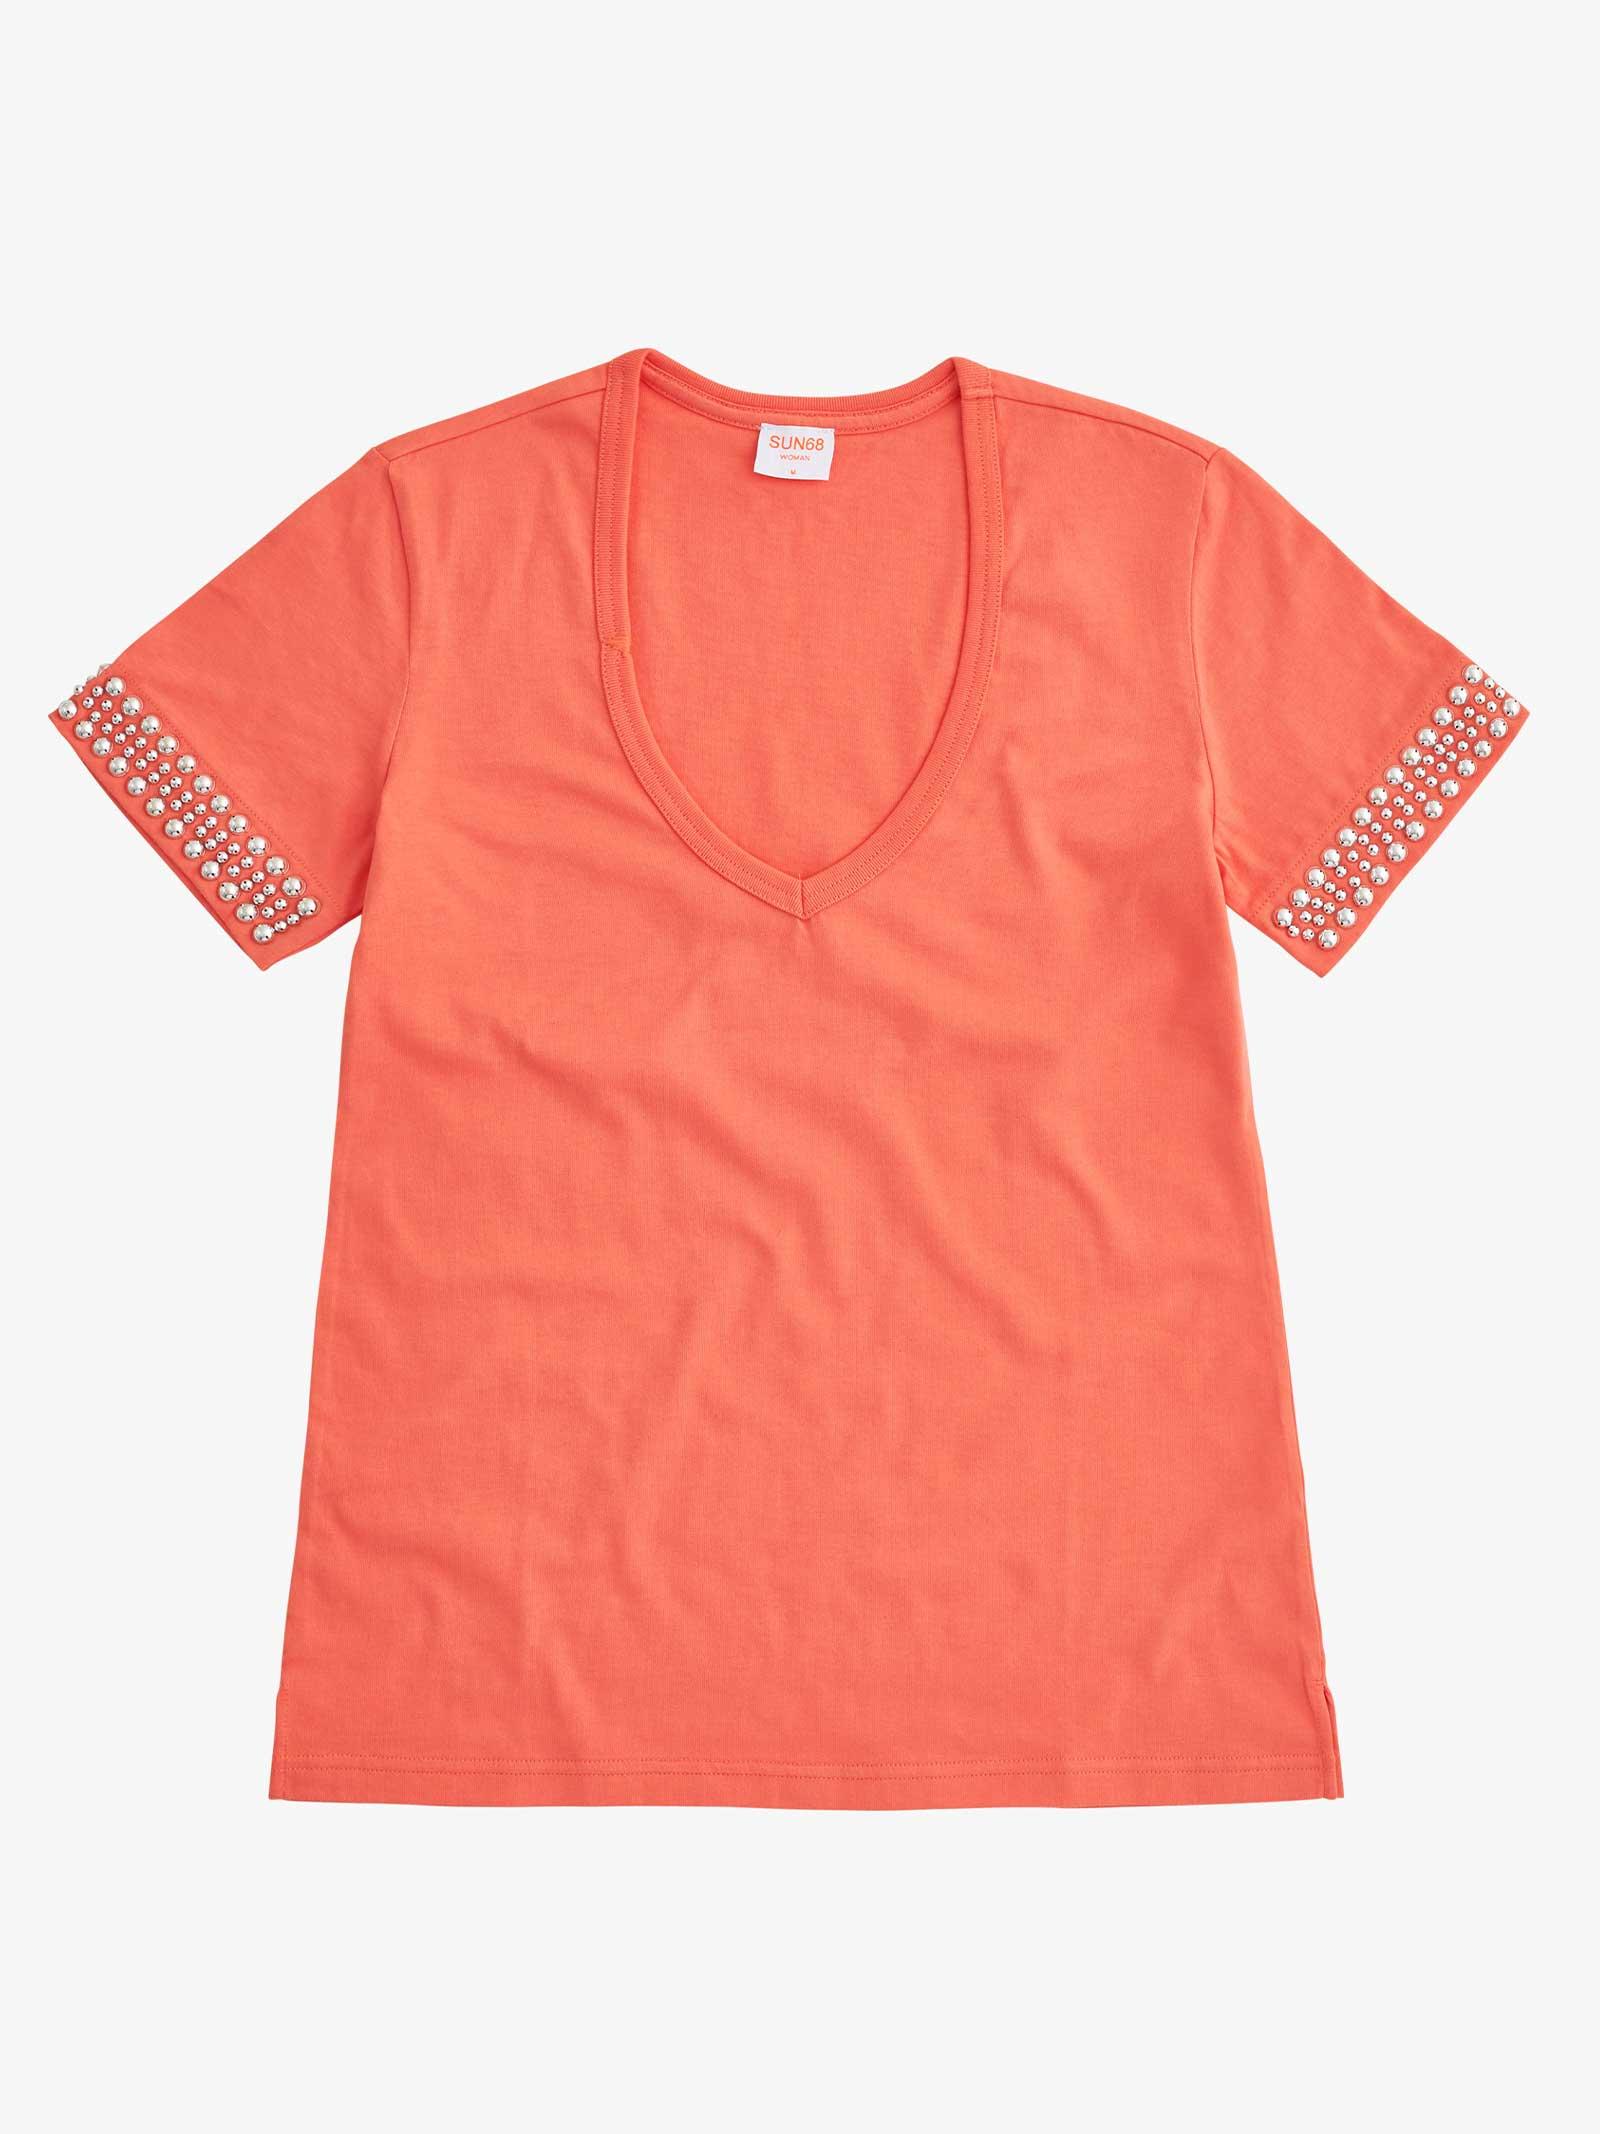 T-SHIRT DONNA SUN68 | T-shirt | T3120396